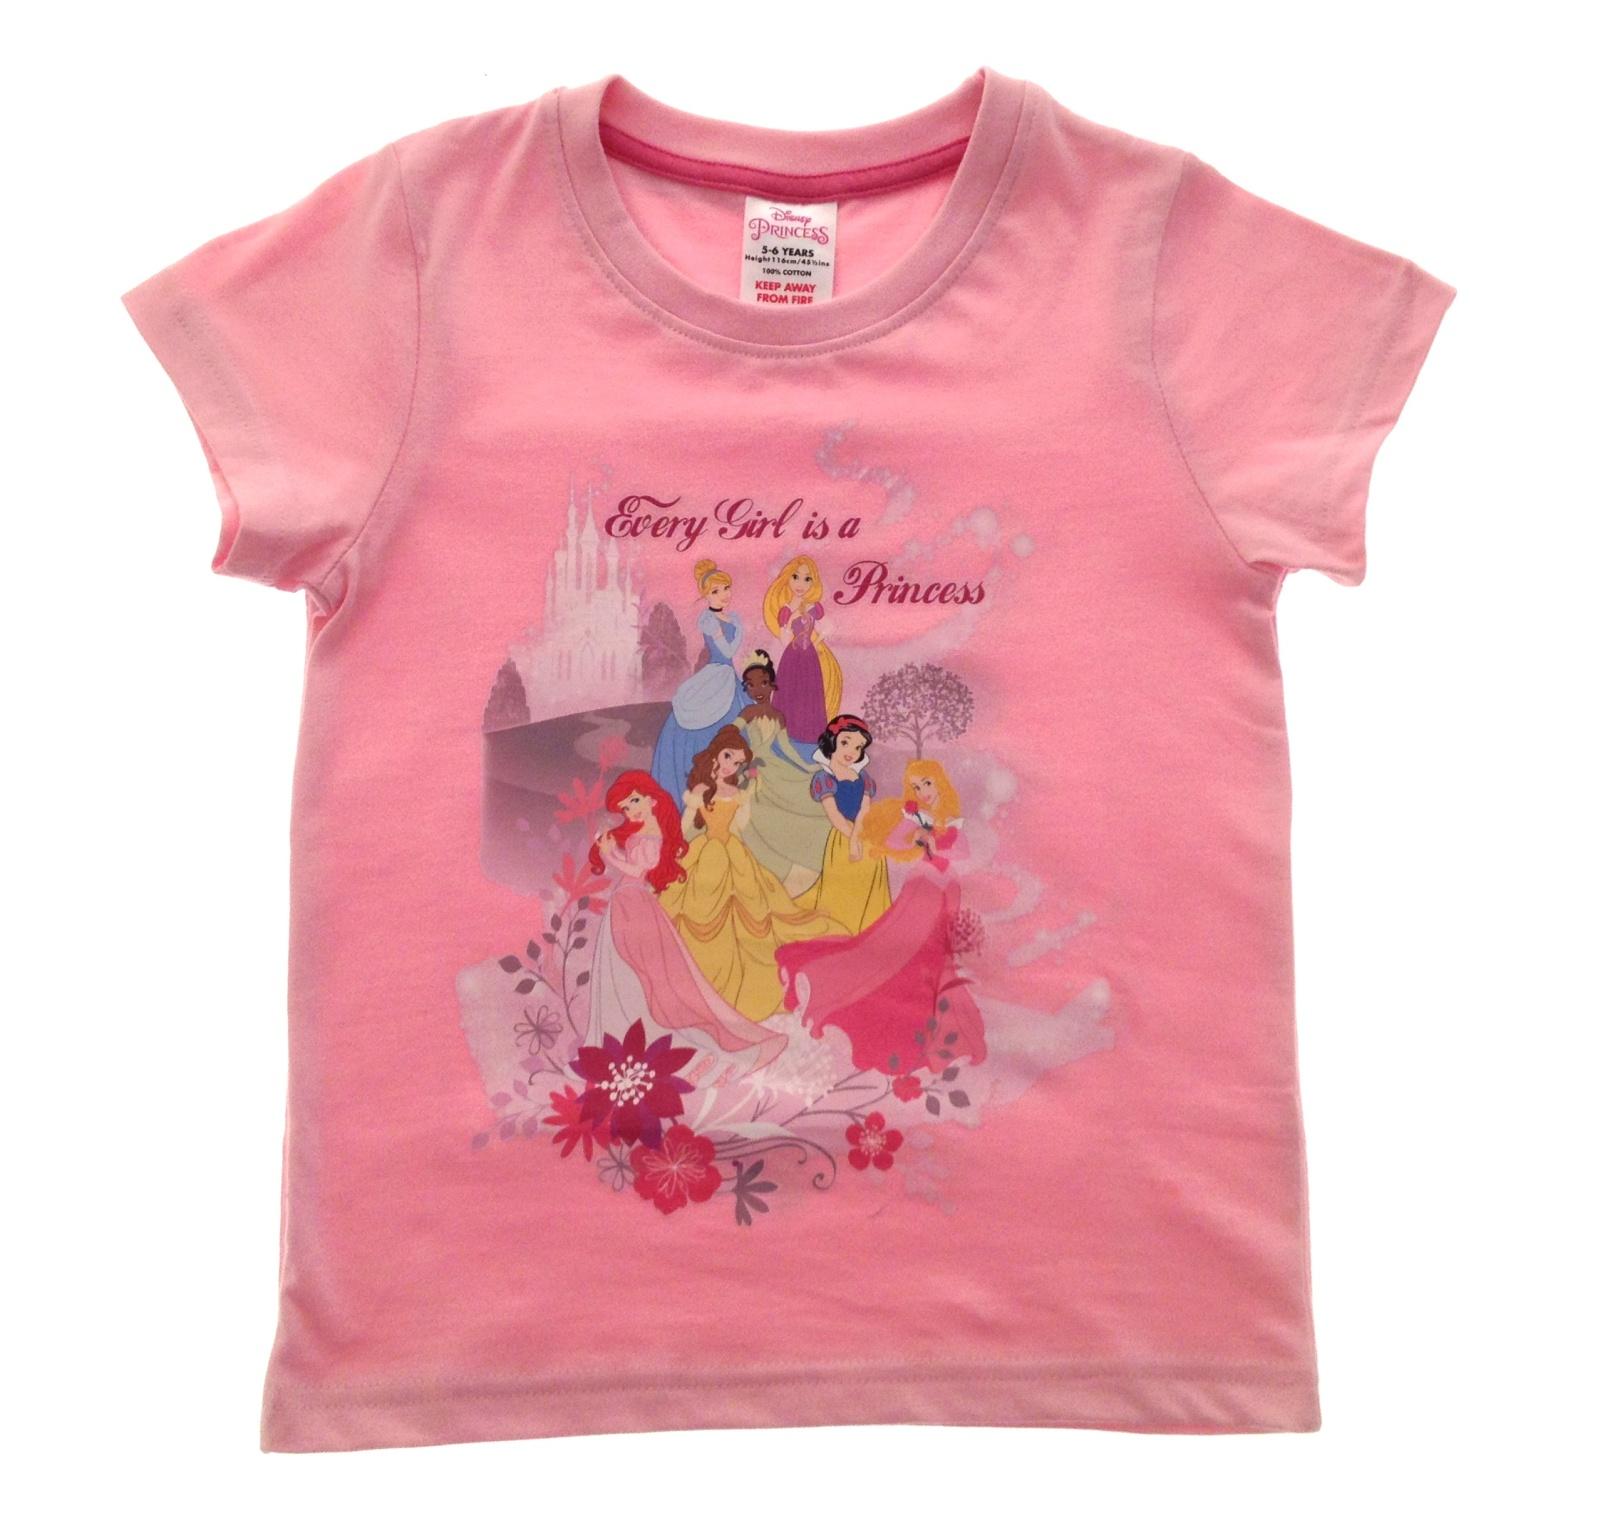 girls disney princess character summer top t shirt childrens size uk 1 6 years. Black Bedroom Furniture Sets. Home Design Ideas